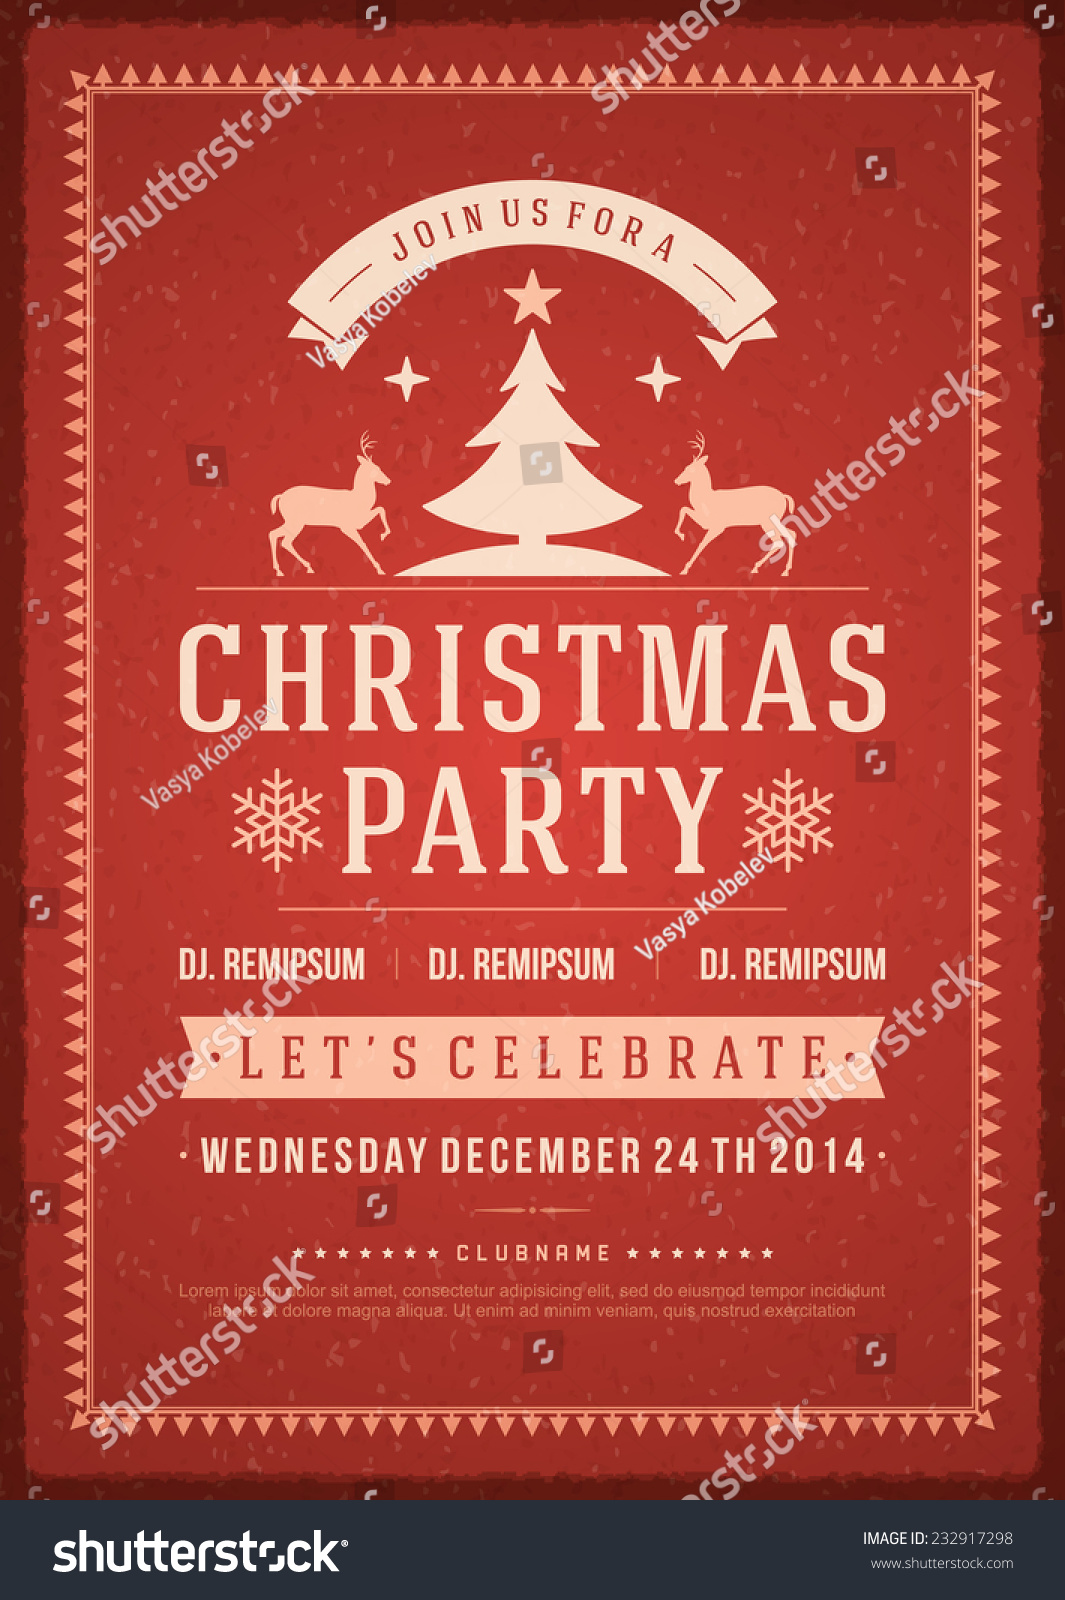 Christmas Party Invitation Retro Typography Ornament Stock Vector ...